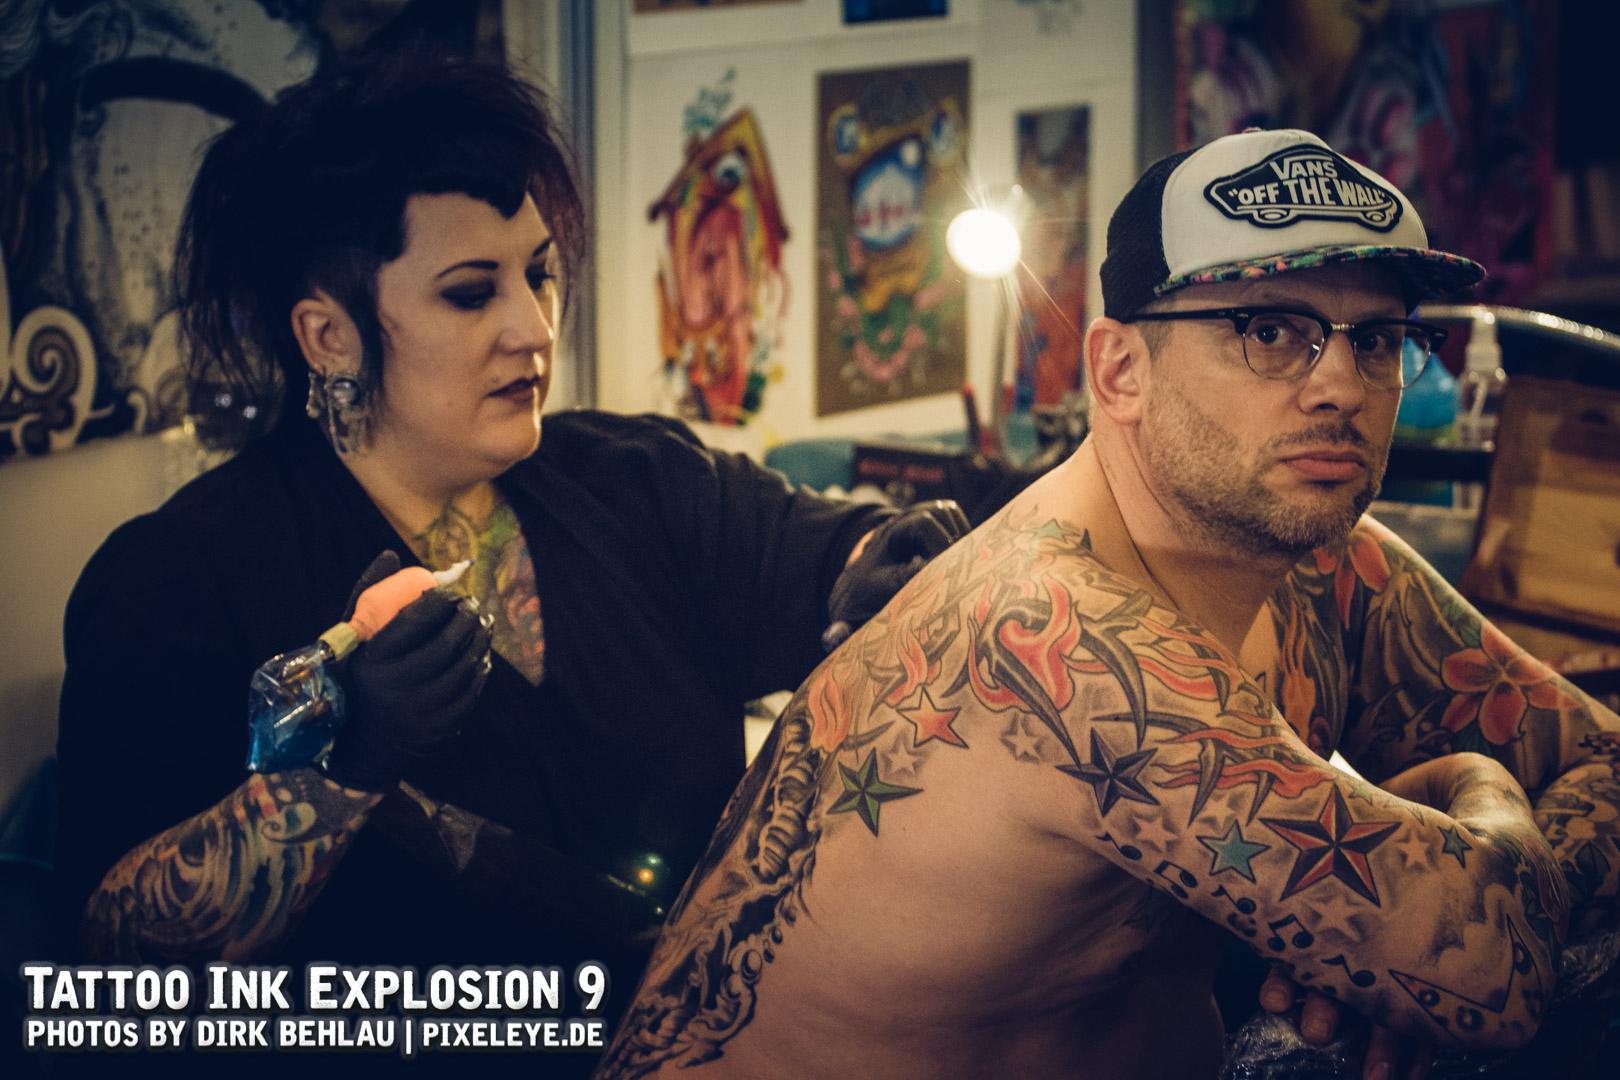 Tattoo Ink Explosion 2018 WEB by Dirk Behlau-1300.jpg